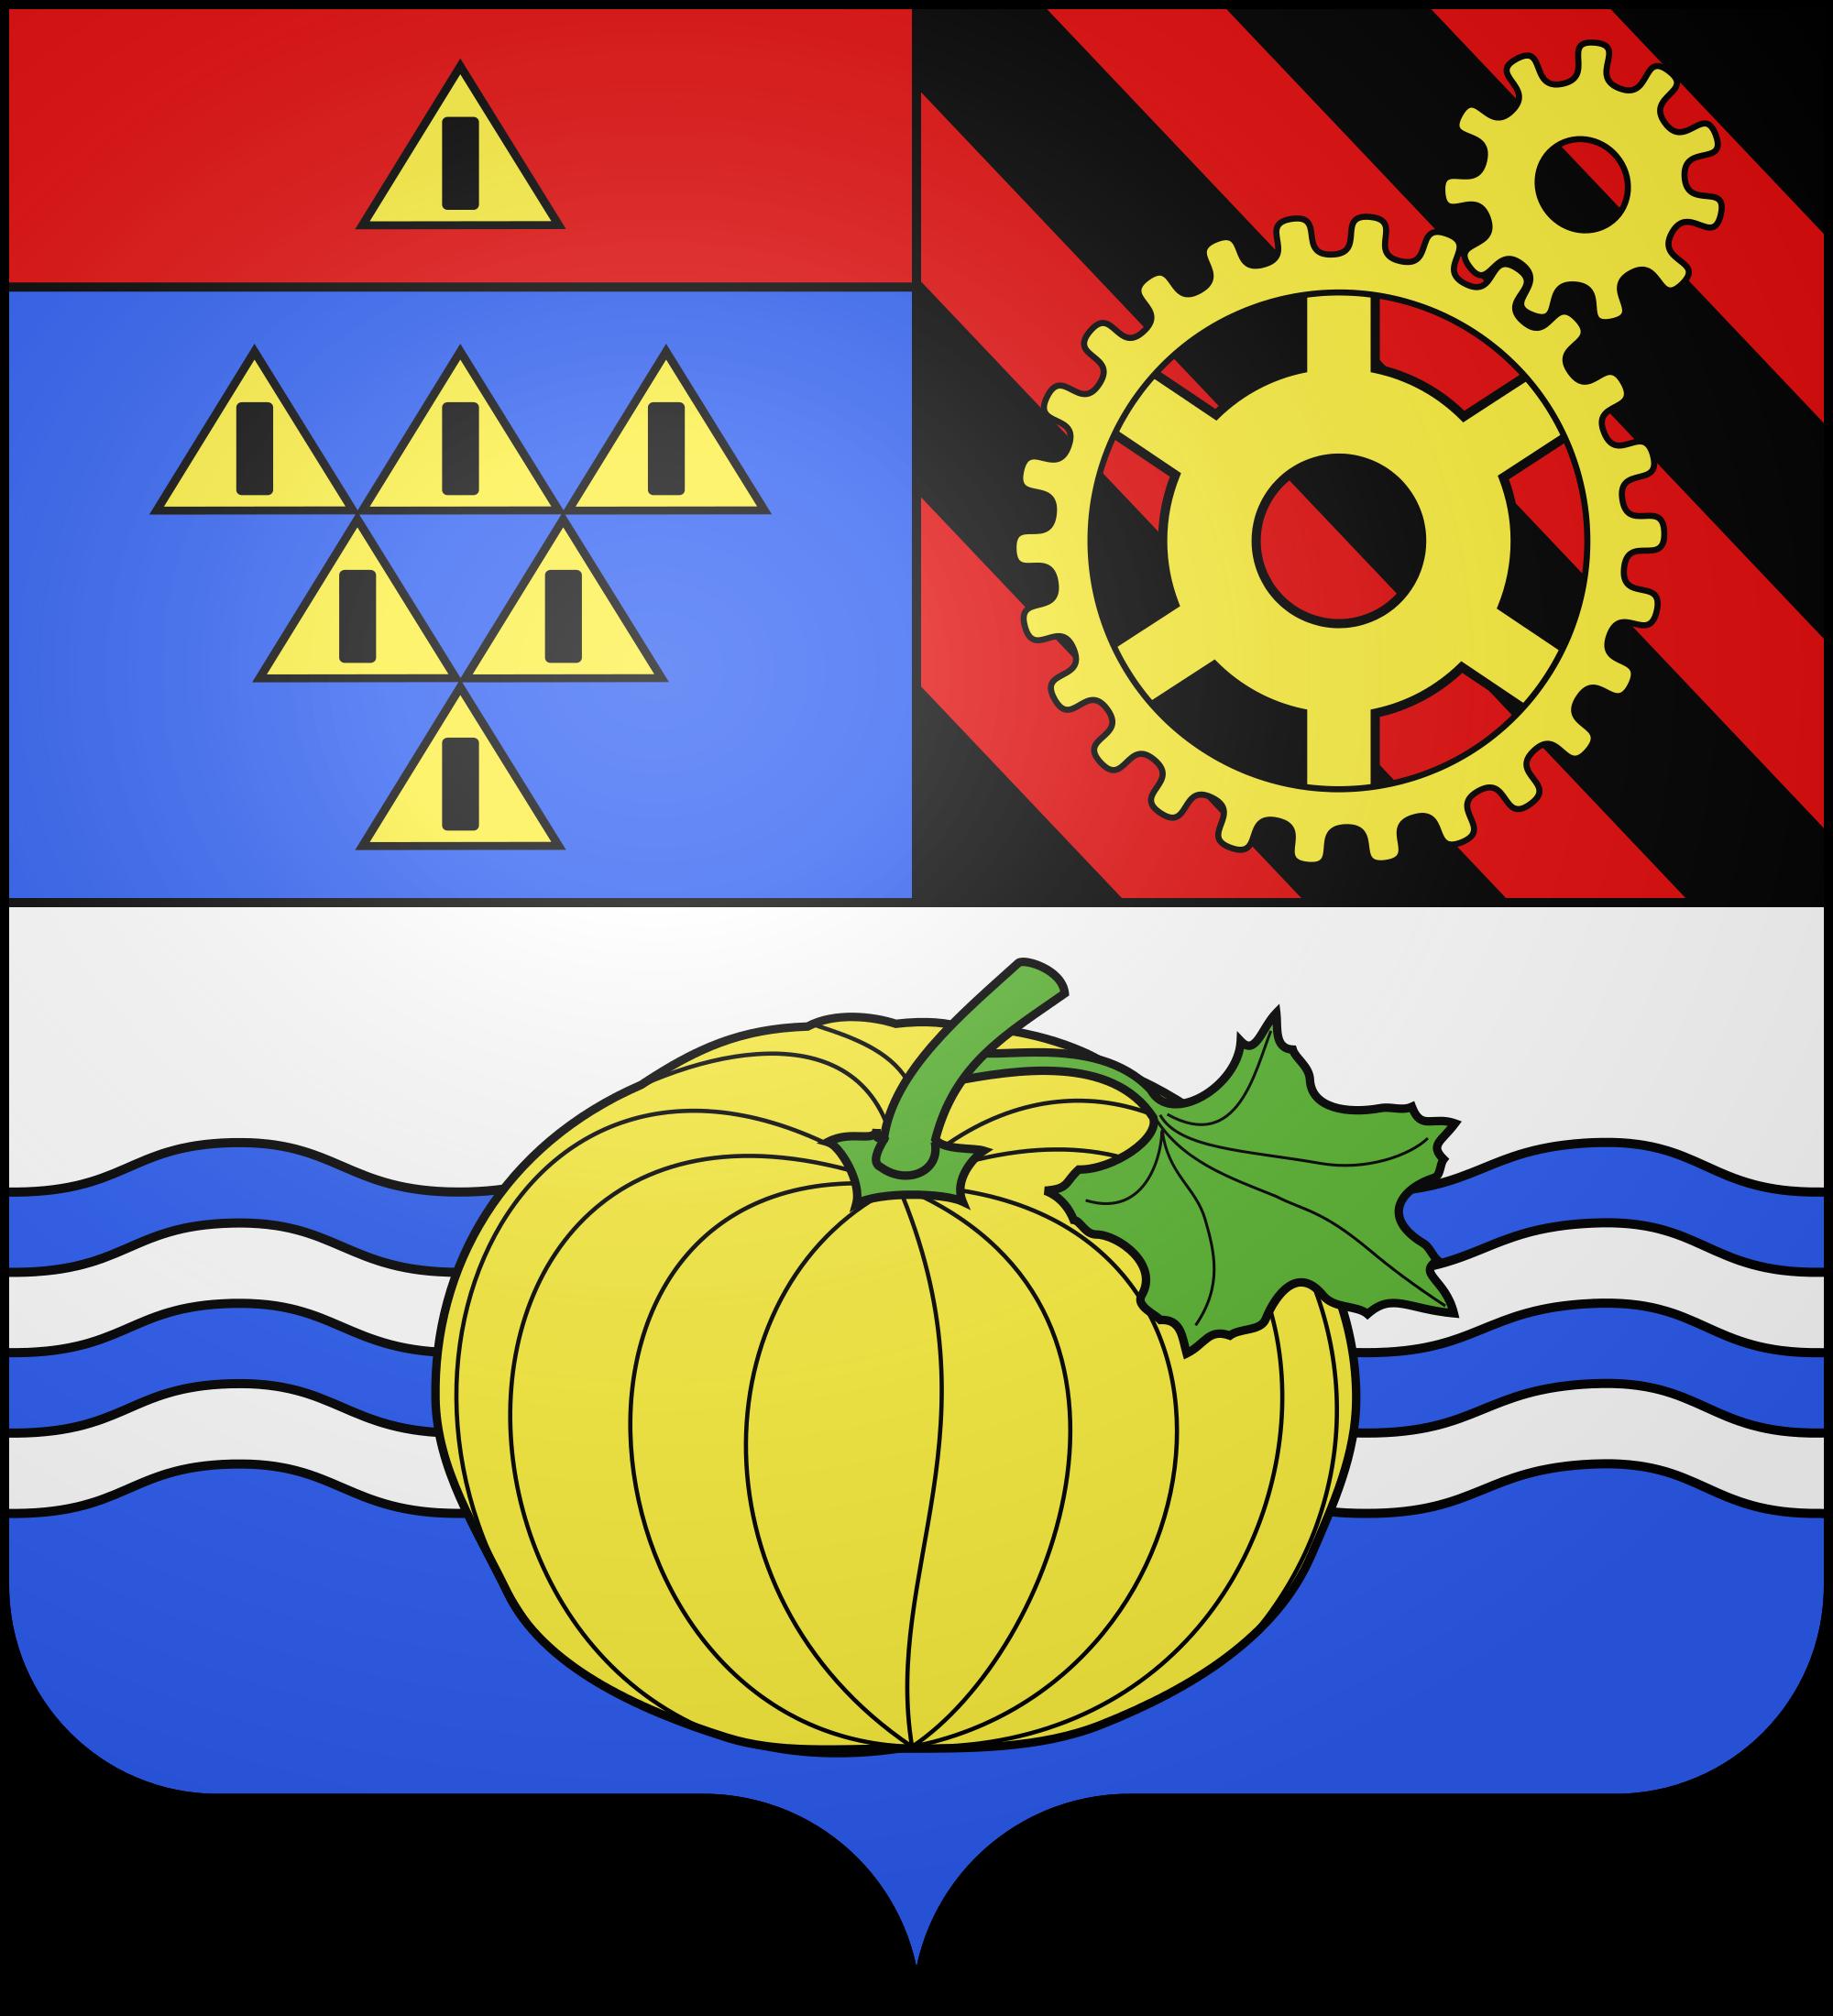 File:Blason ville fr Seloncourt (Doubs).svg.